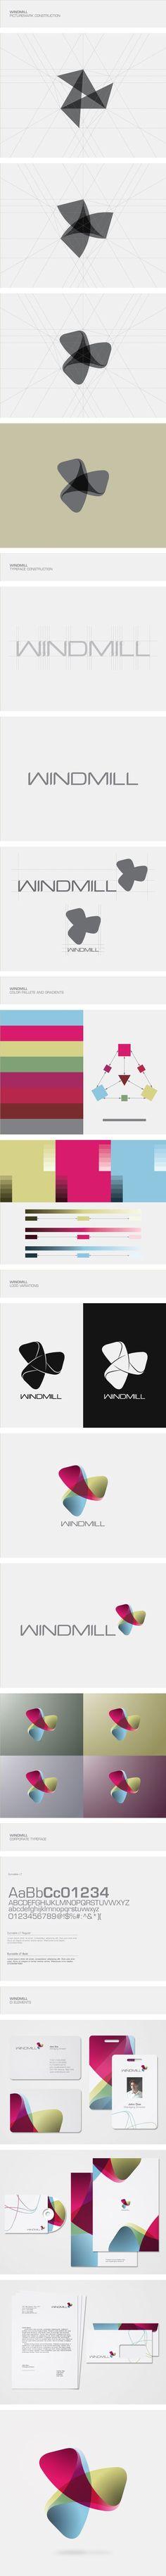 Windmill Visual Identity by Eduard Kovacs: